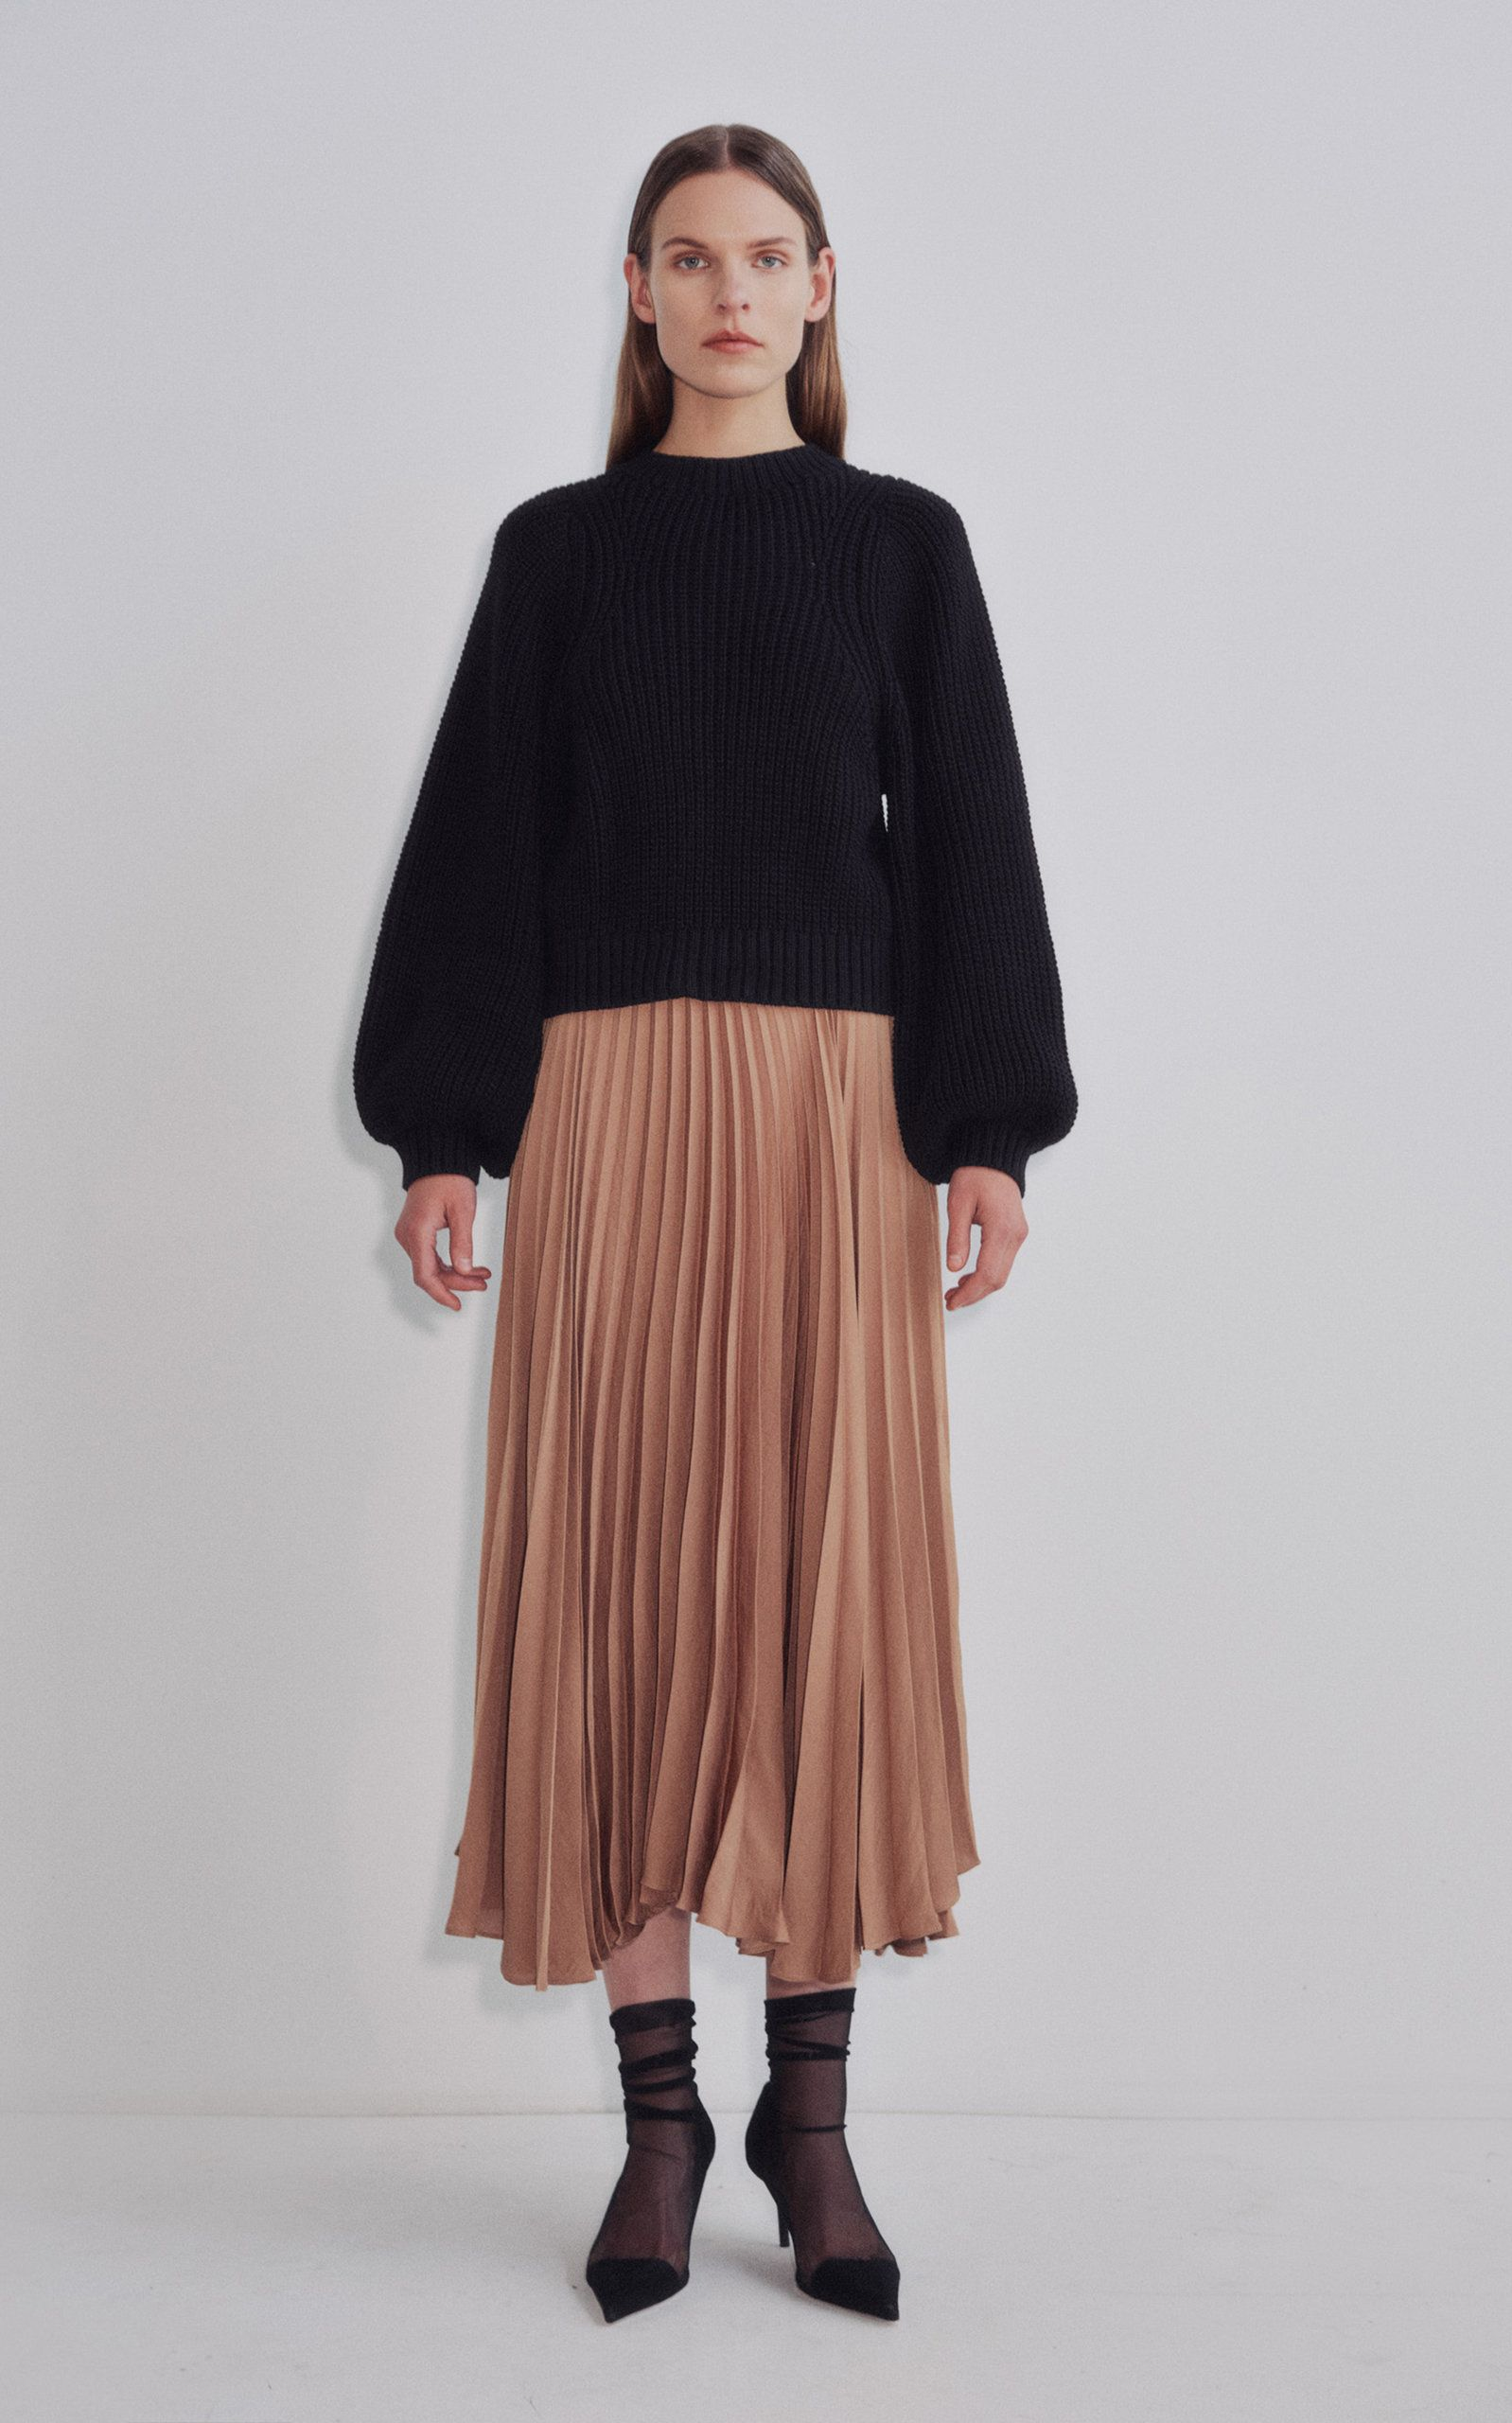 Photo of Aster Pleated Midi Skirt by Shaina Mote | Moda Operandi